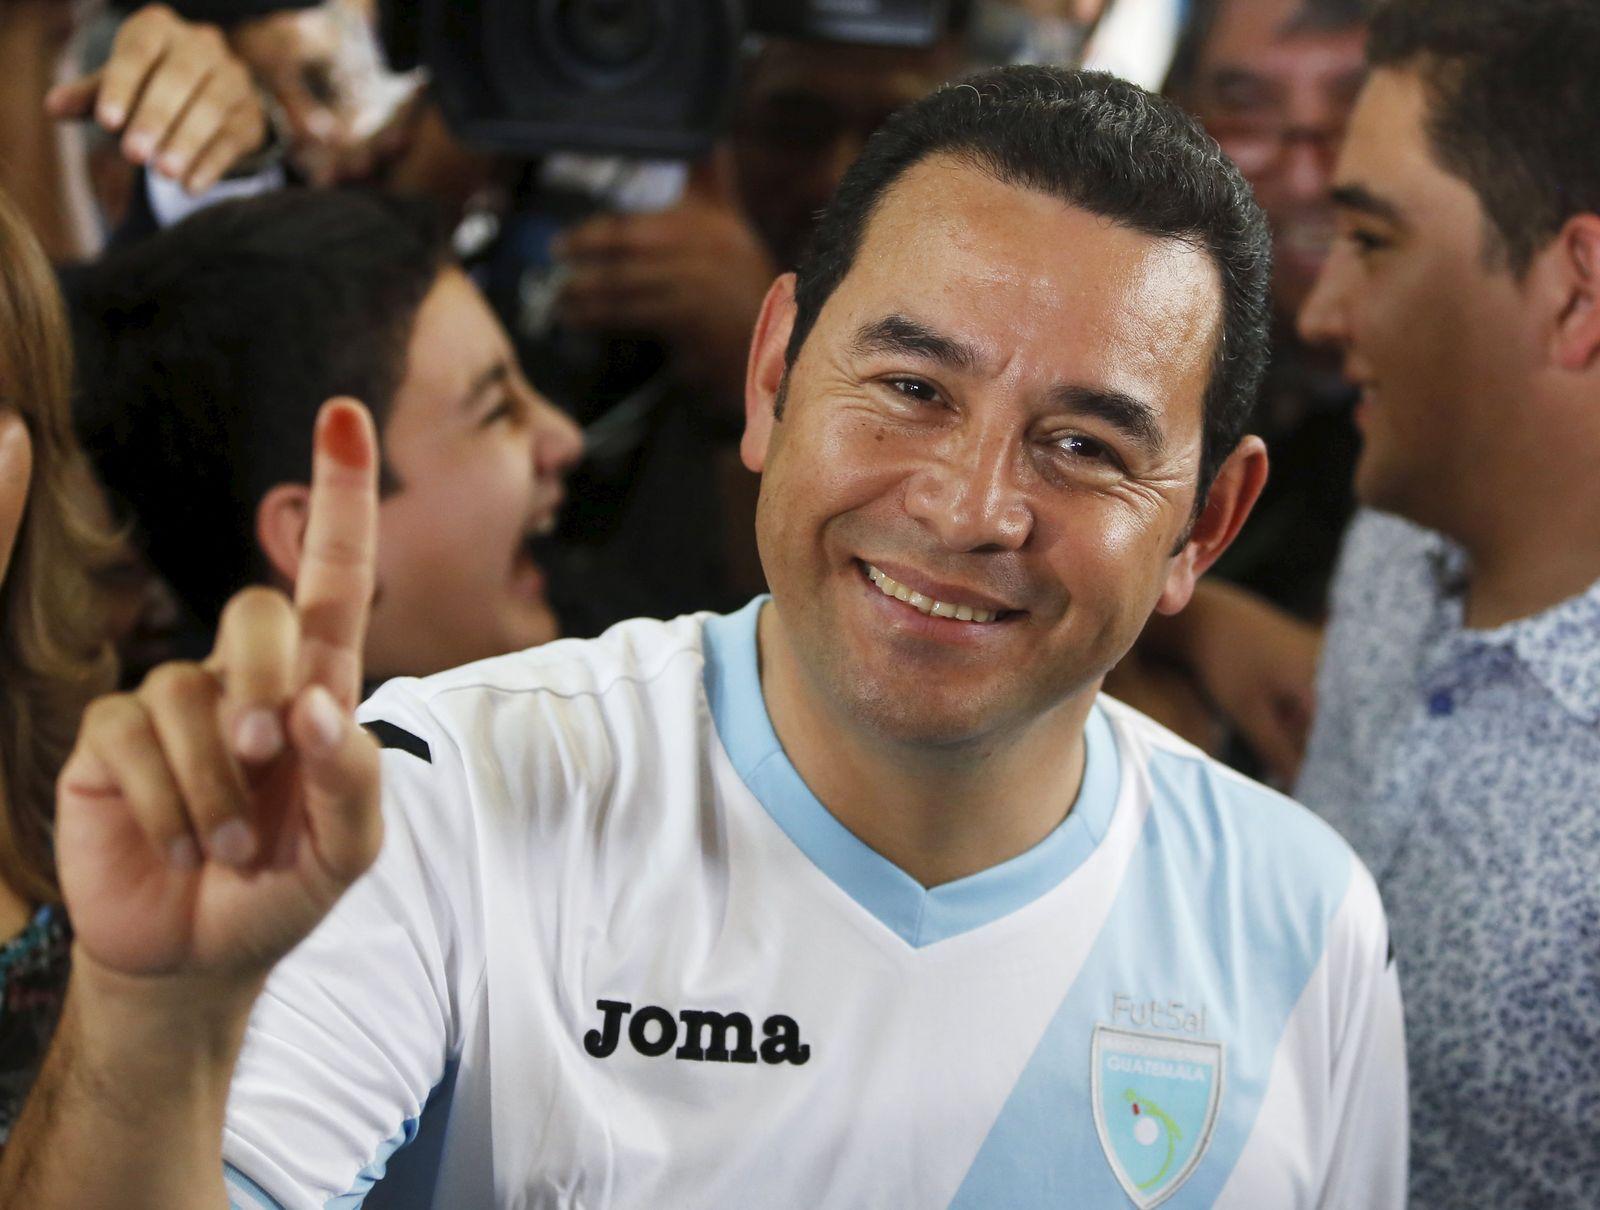 Jimmy Morales / Guatemala